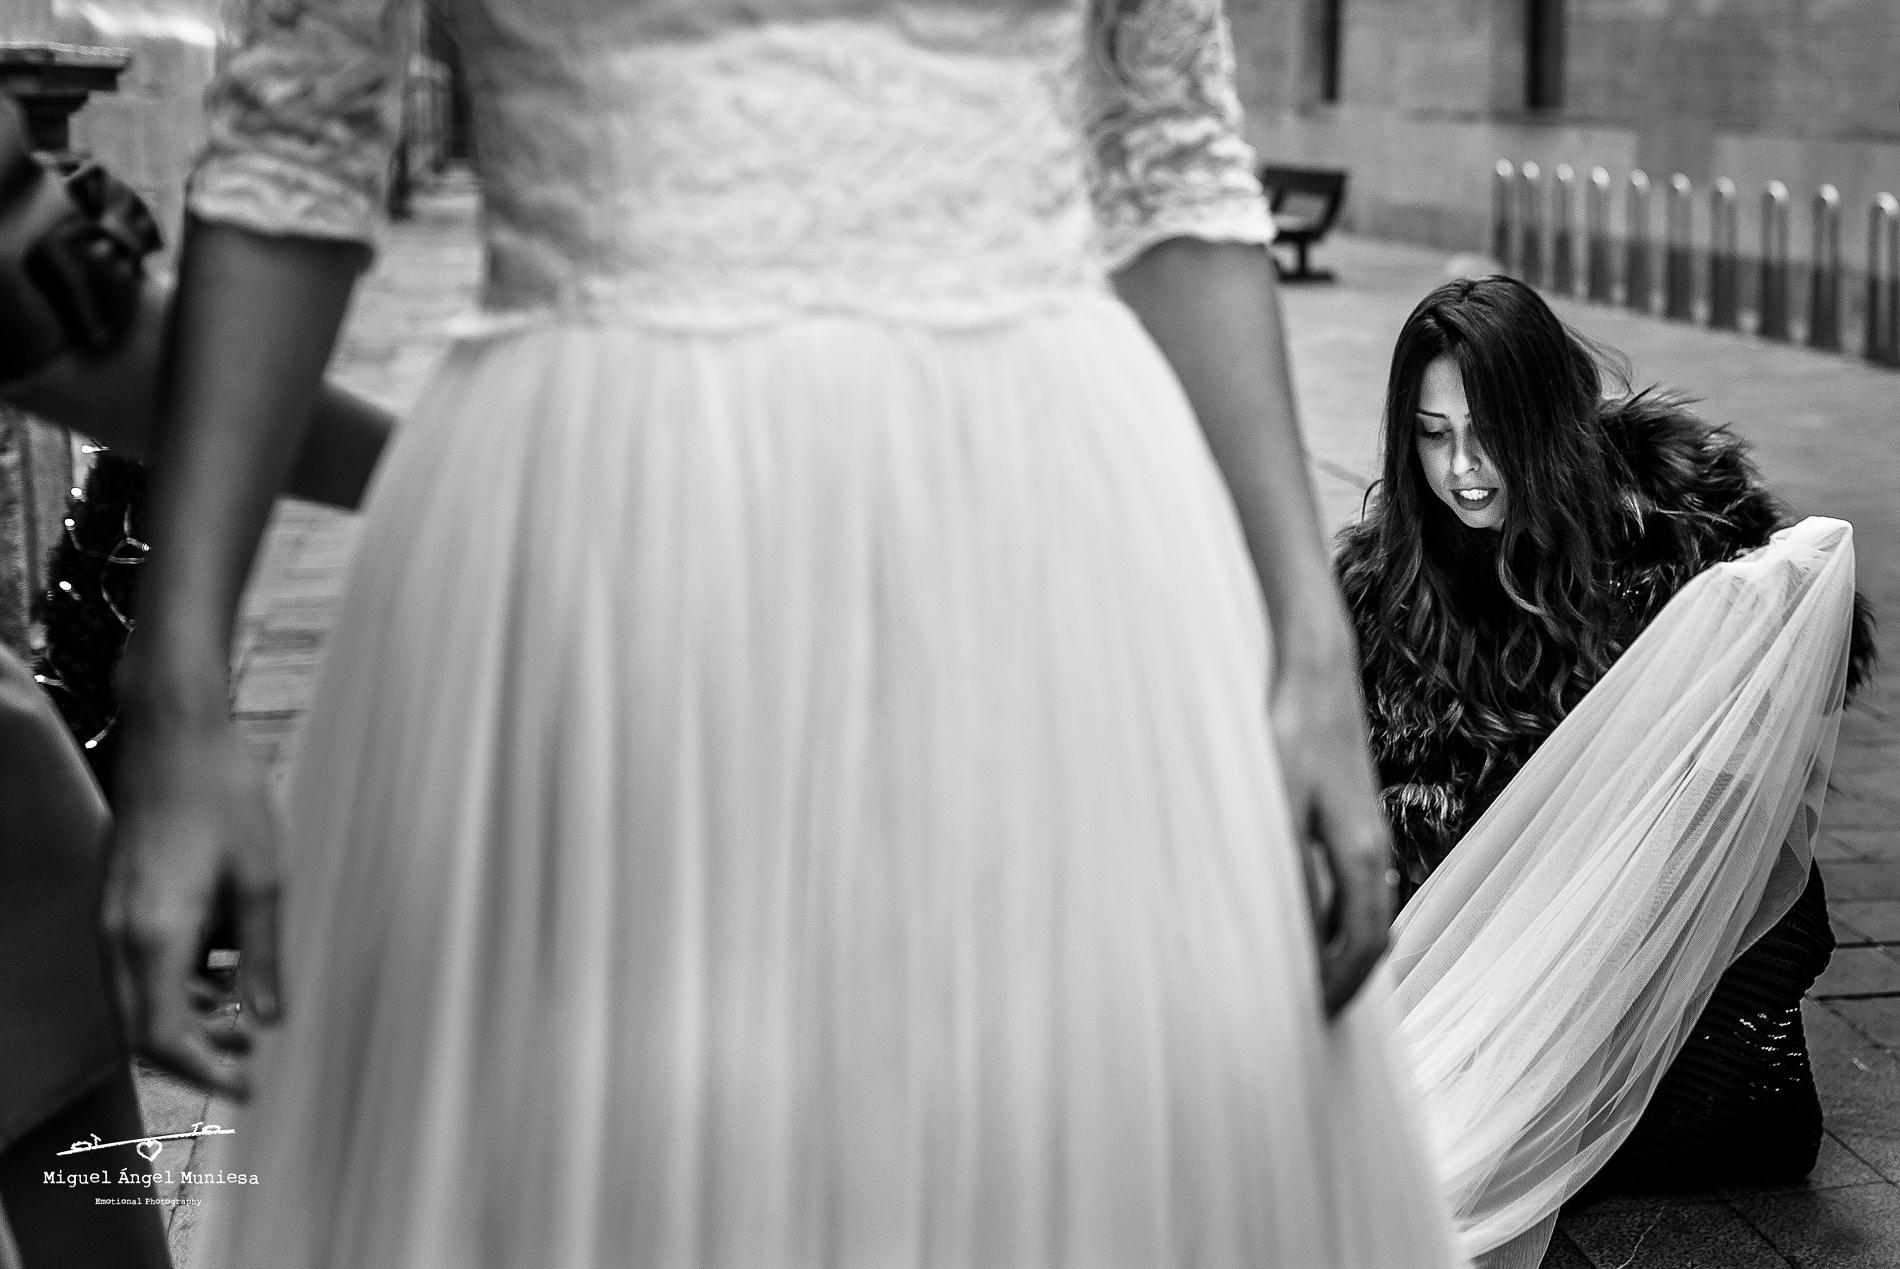 miguel angel muniesa, fotografo boda Teruel, fotografo boda navarra, fotografo boda zaragoza, fotografo boda soria, miguel angel muniesa emotional photography_13